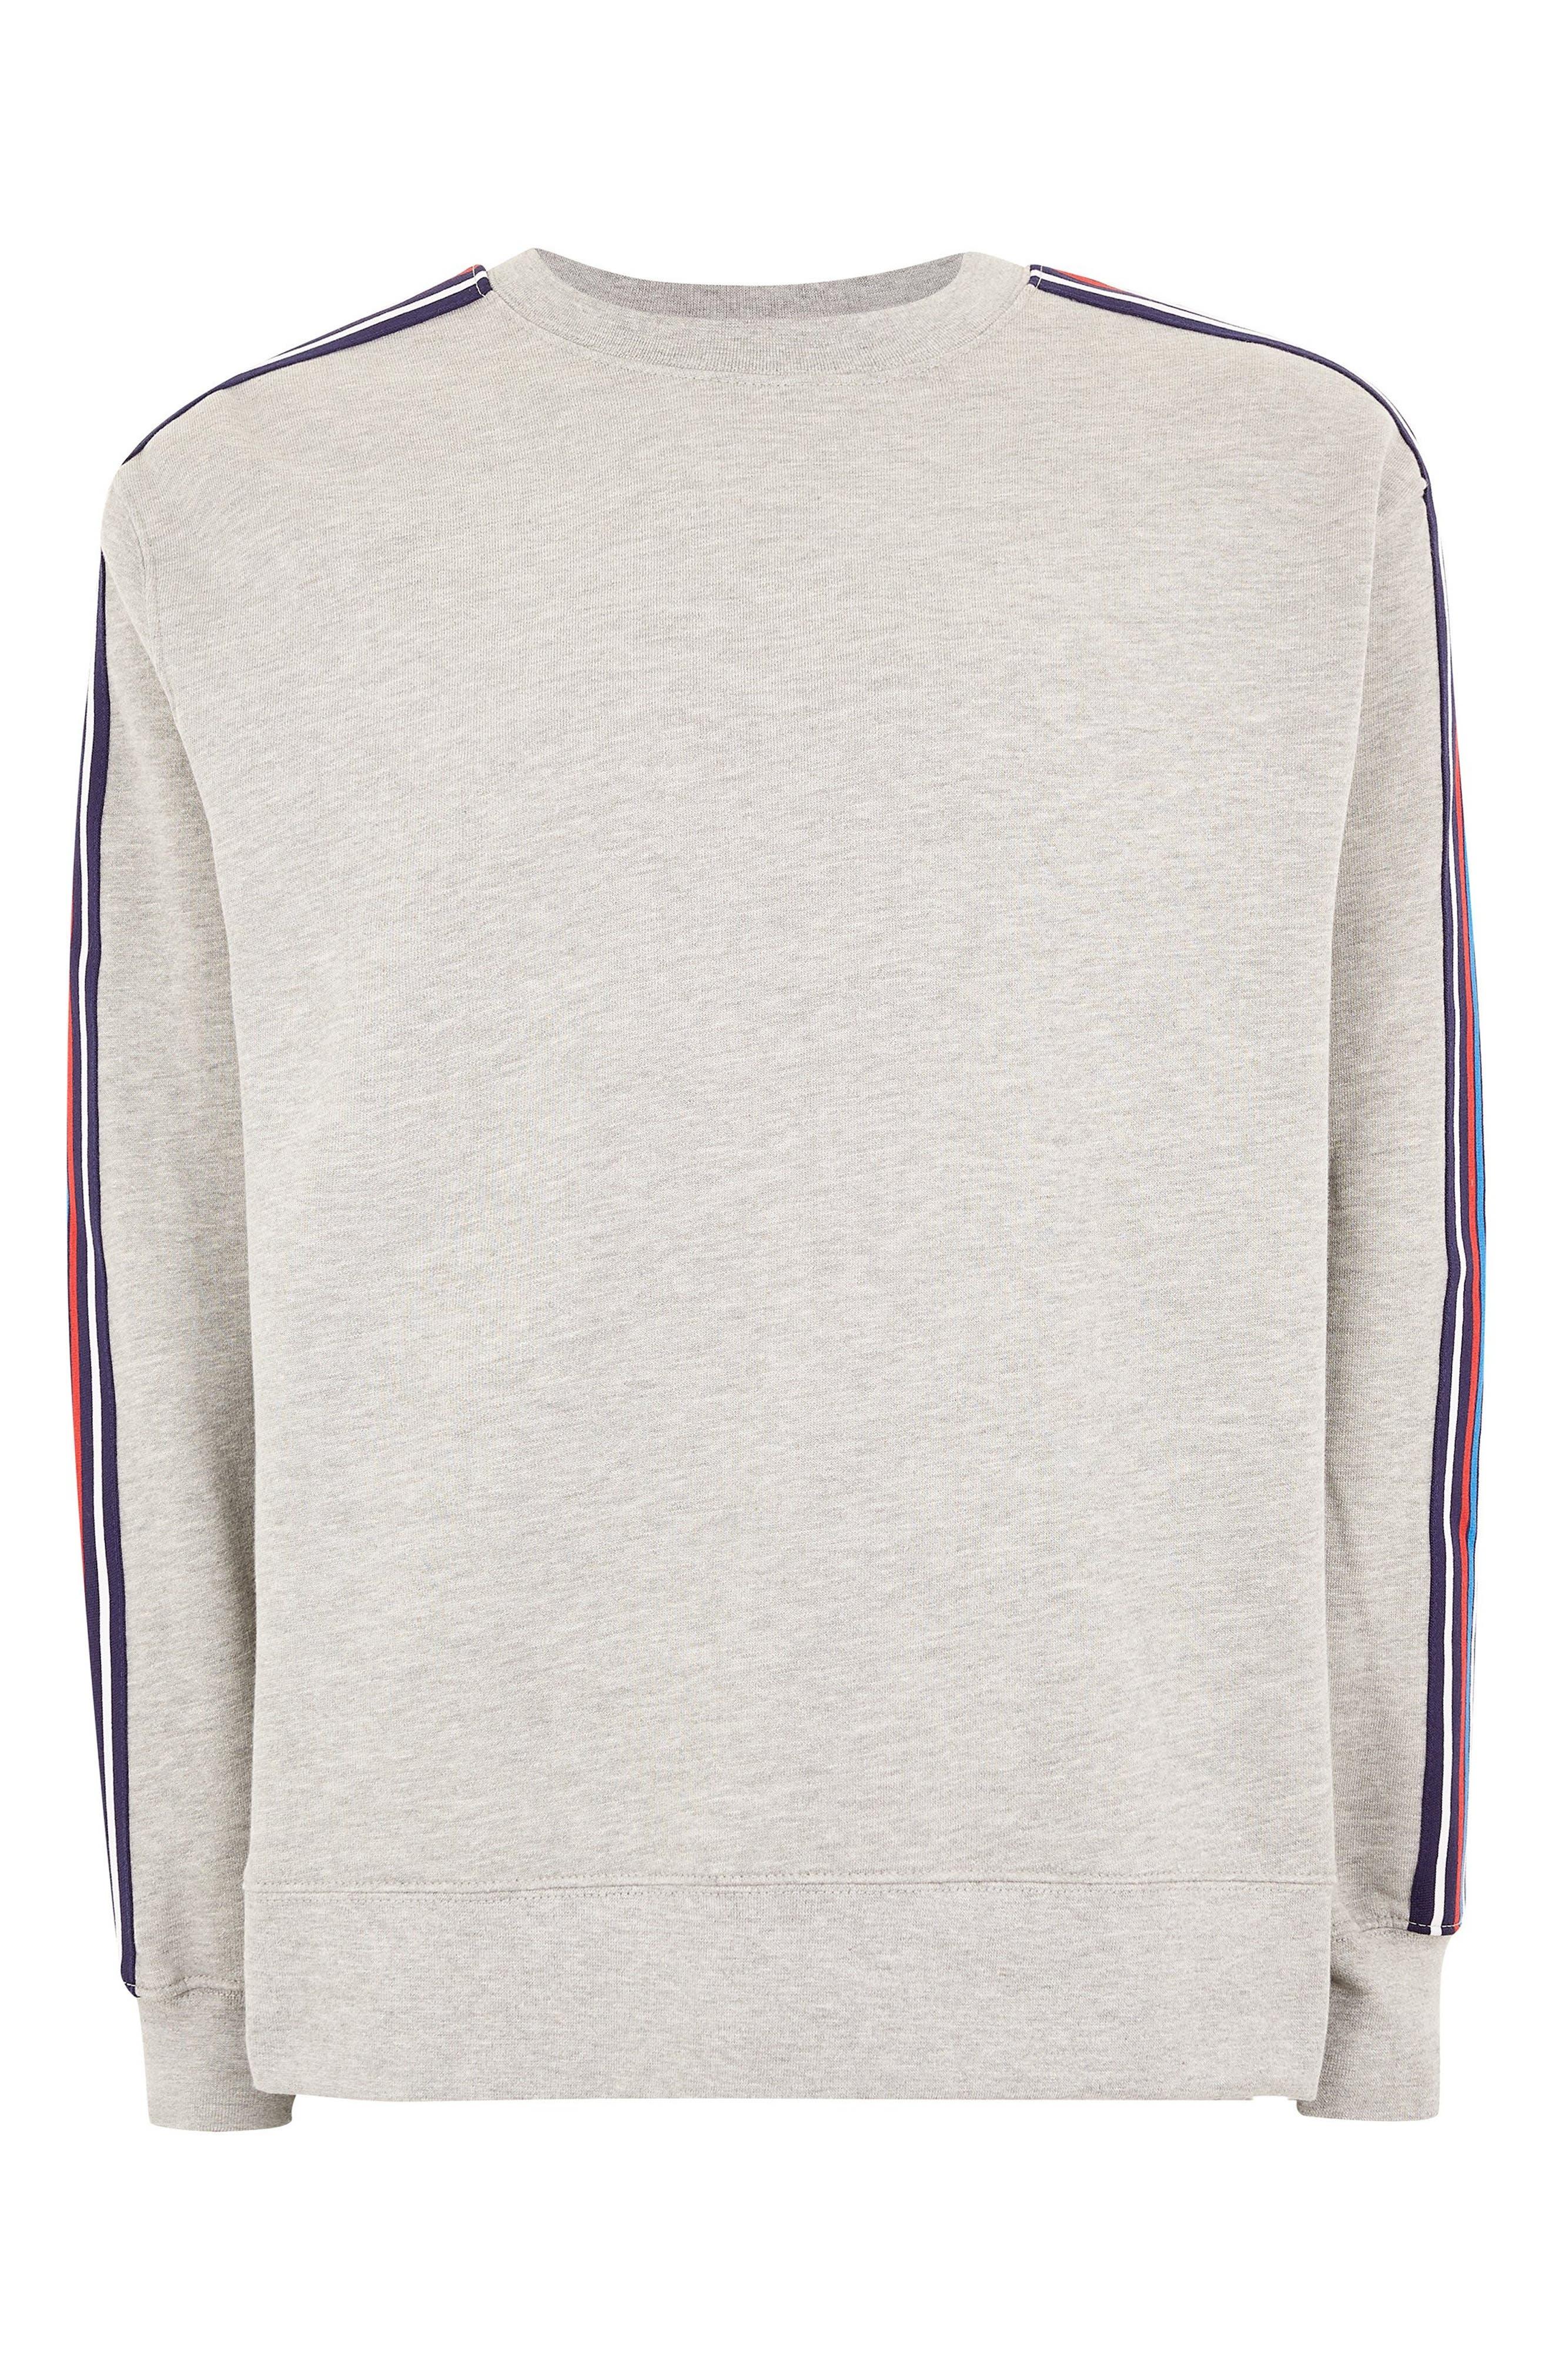 TOPMAN, Tape Crewneck Sweatshirt, Alternate thumbnail 4, color, LIGHT GREY